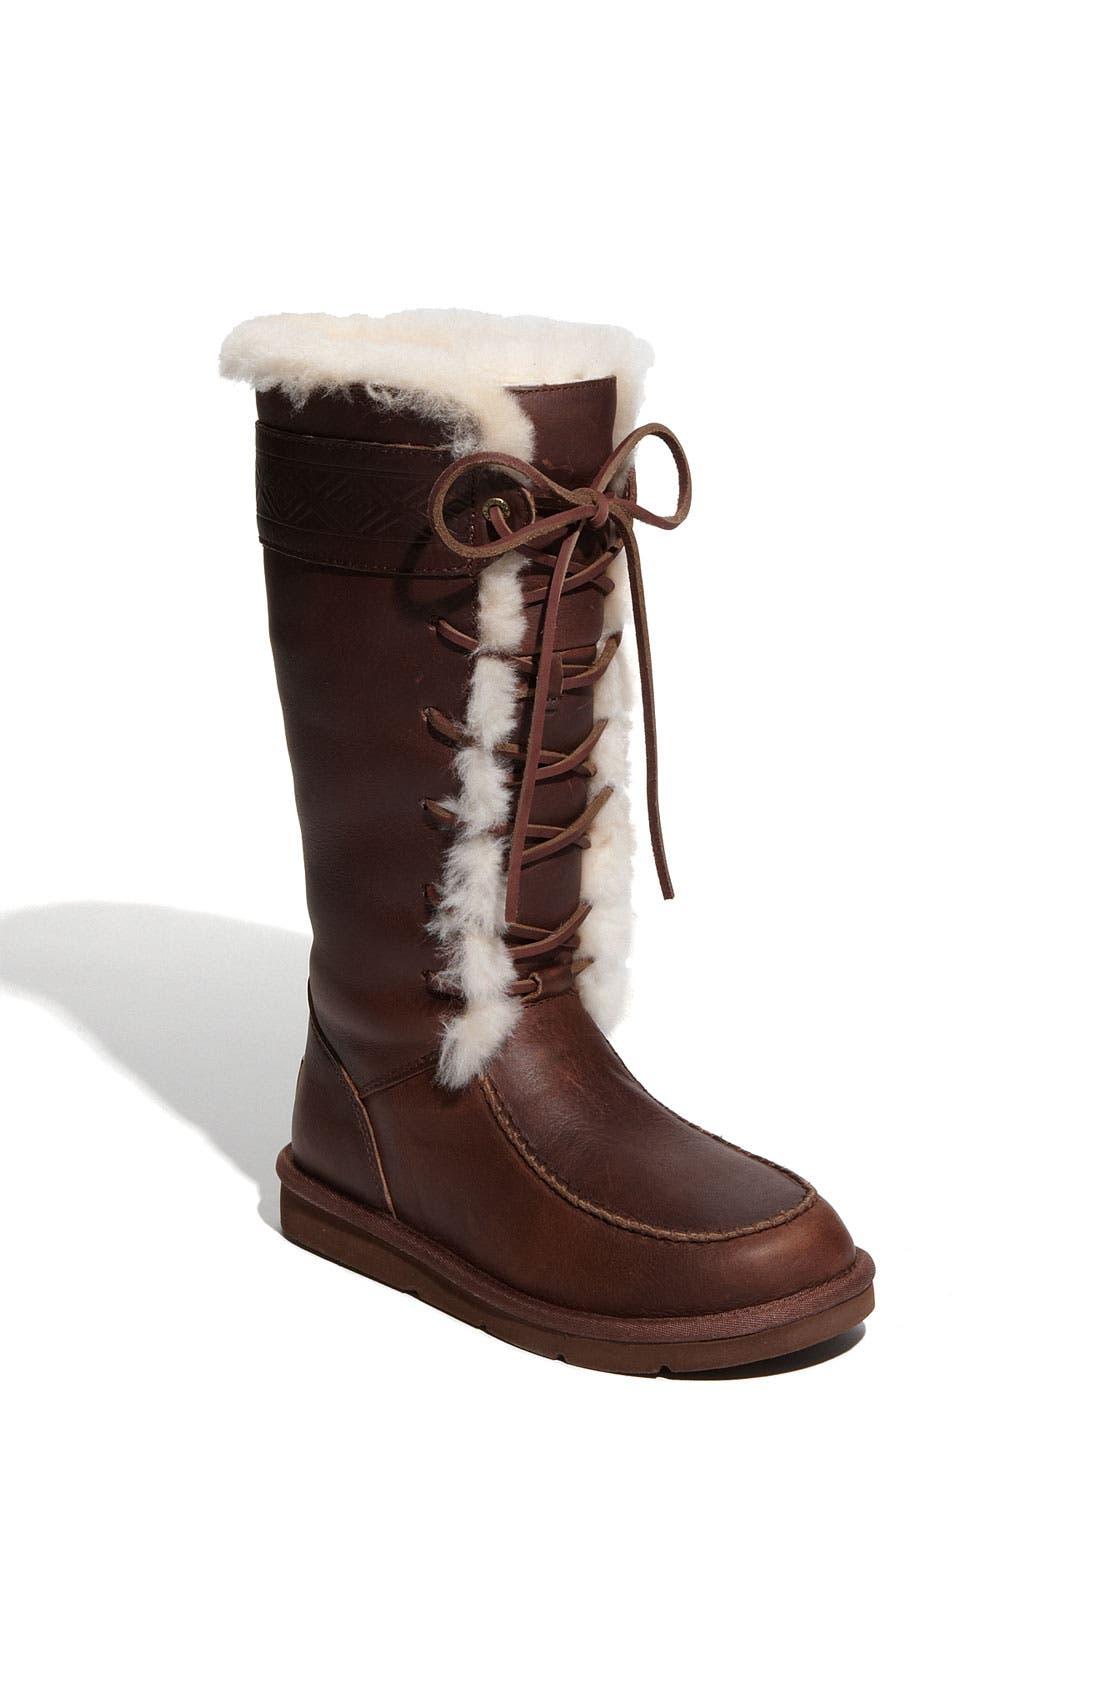 Alternate Image 1 Selected - UGG® Australia 'Tularosa' Boot